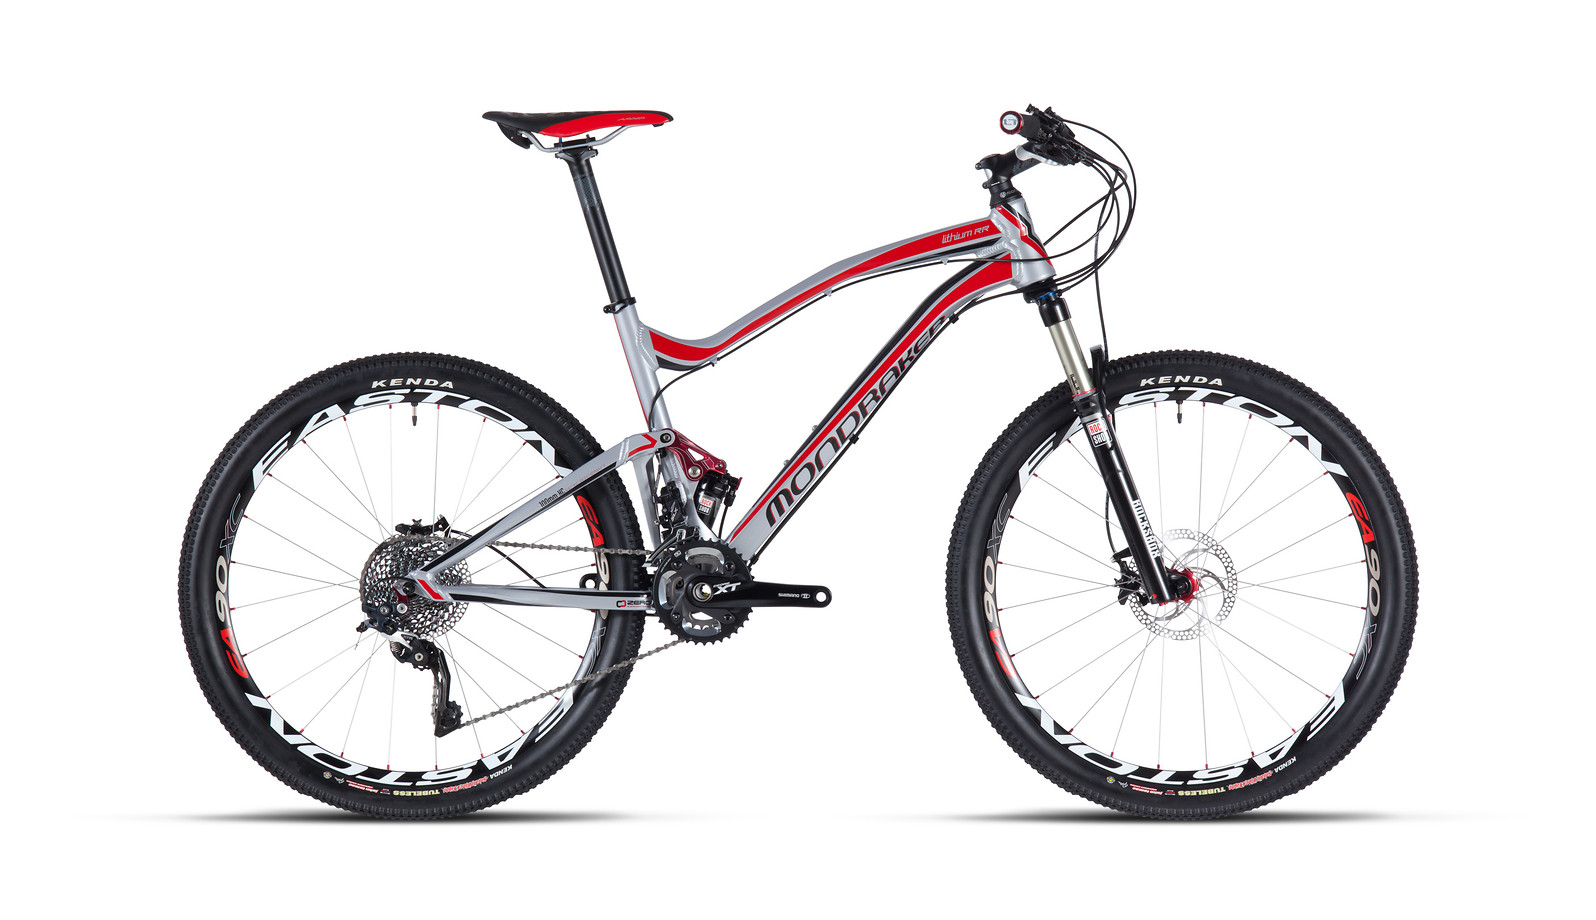 bike - mondraker lithium rr